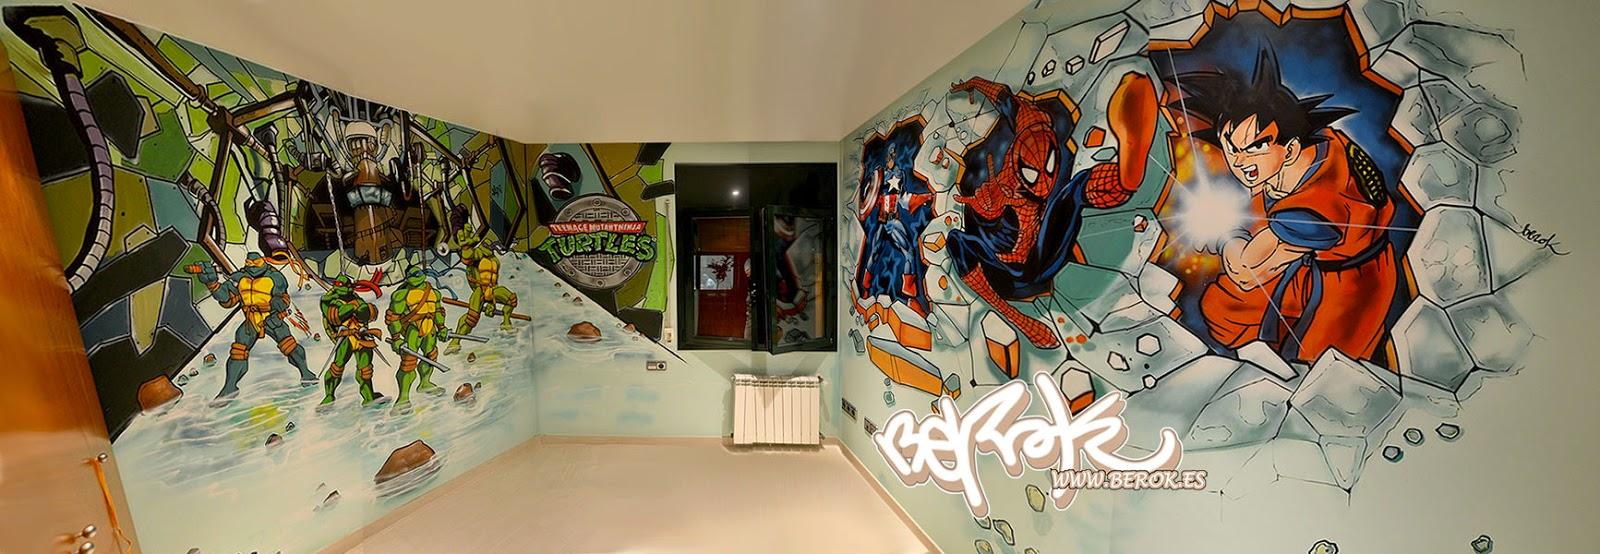 Berok graffiti mural profesional en barcelona habitaci n for Cuarto para las 5